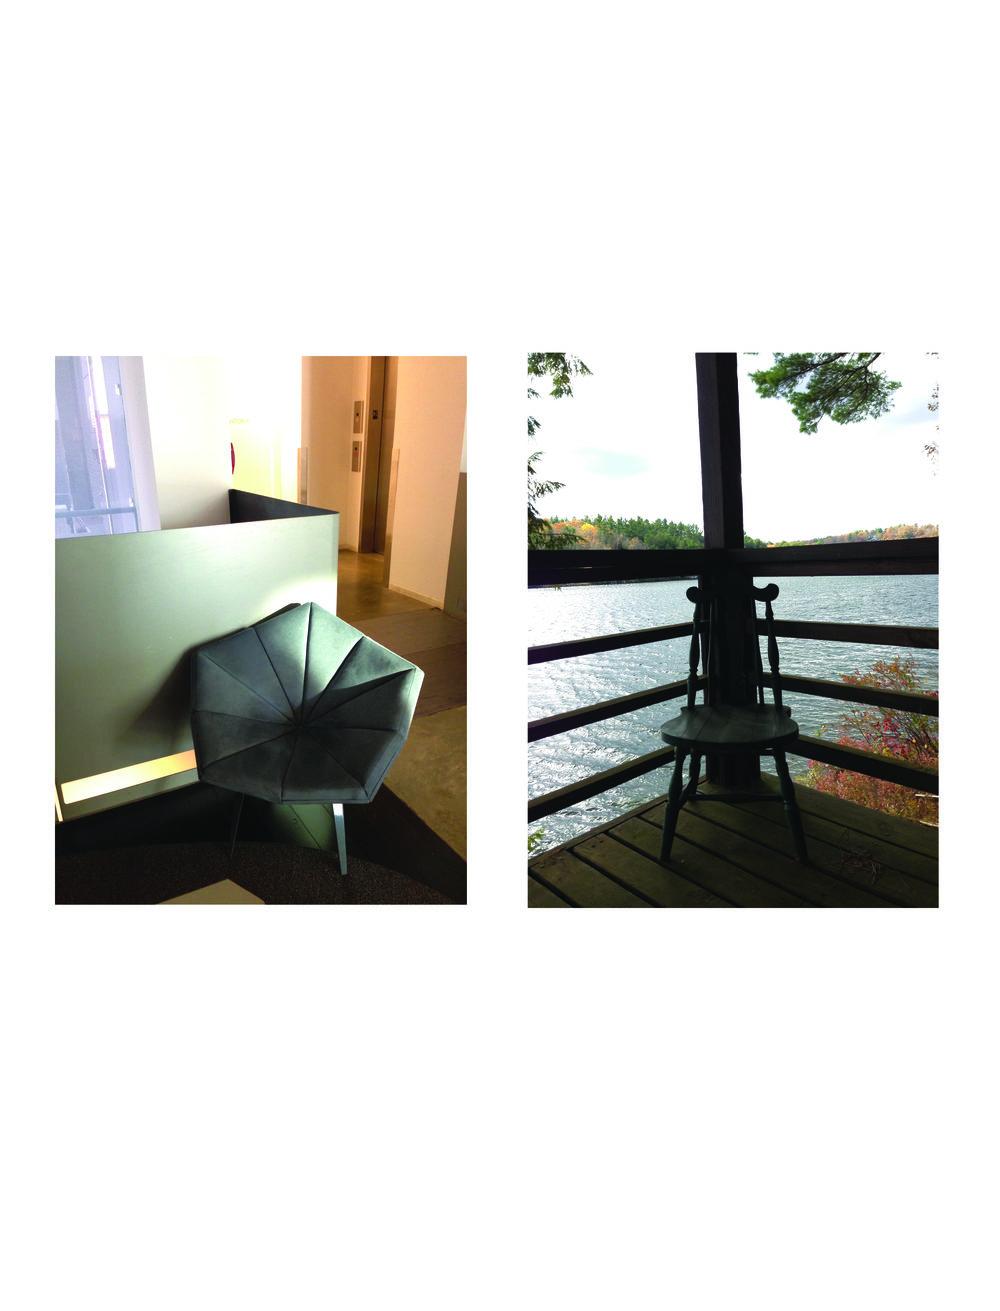 Cabin Grannof Contrast_Page_01.jpg